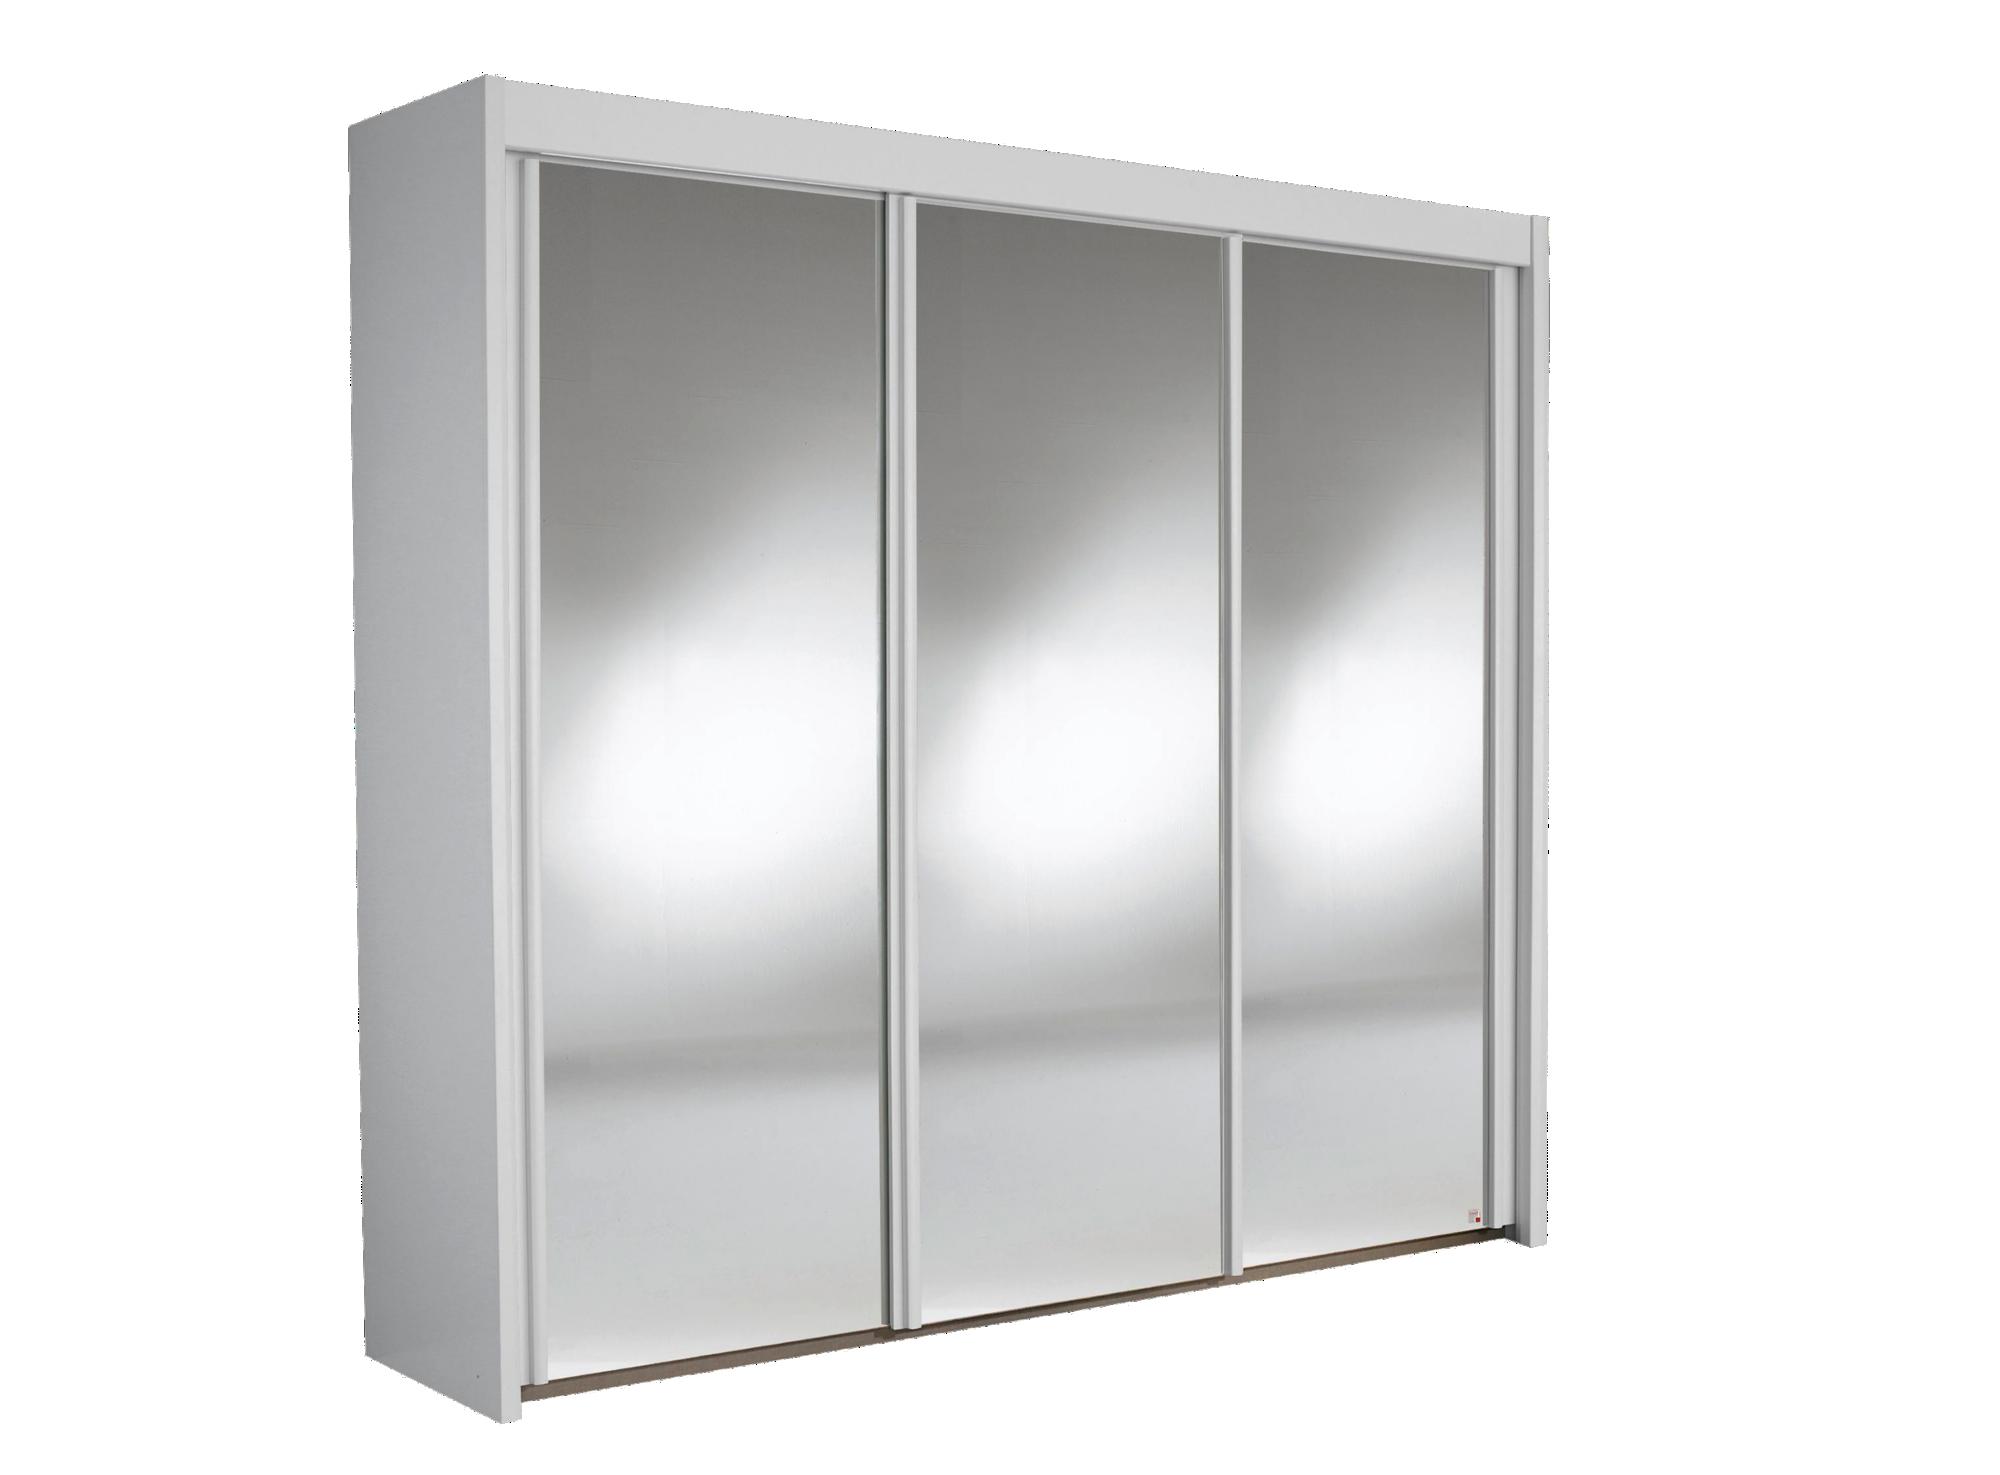 Armoire 3 portes miroir coloris blanc fly for Armoire porte miroir